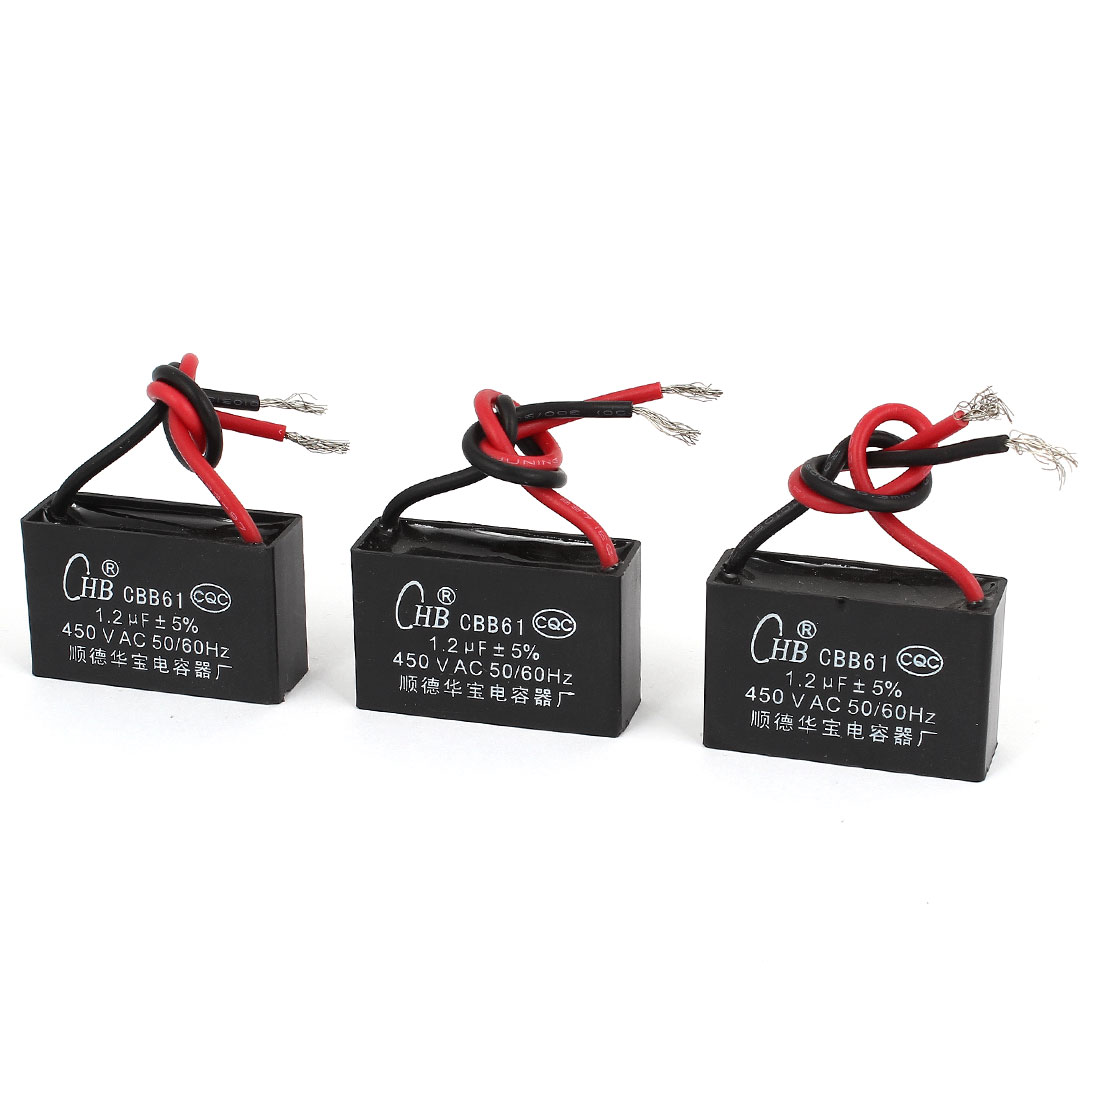 AC 450V 50/60Hz 1.2uF 5% 2 Wired Polypropylene Film Motor Capacitor 3PCS